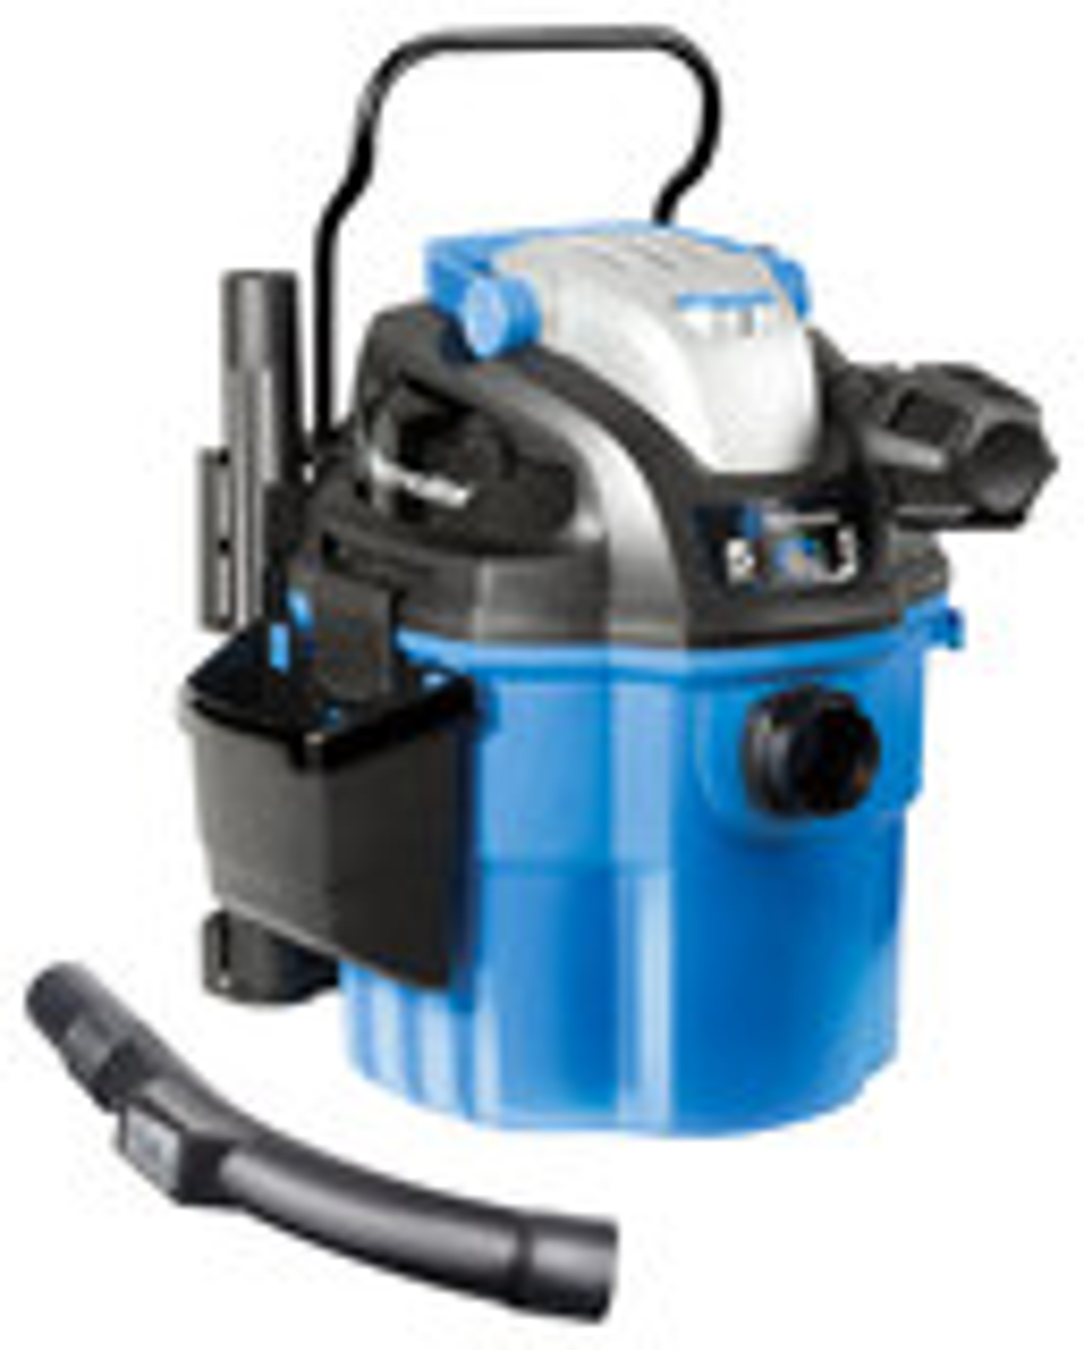 VacMaster VWM510 5-Gallon Wall-Mountable Wet/Dry Vacuum